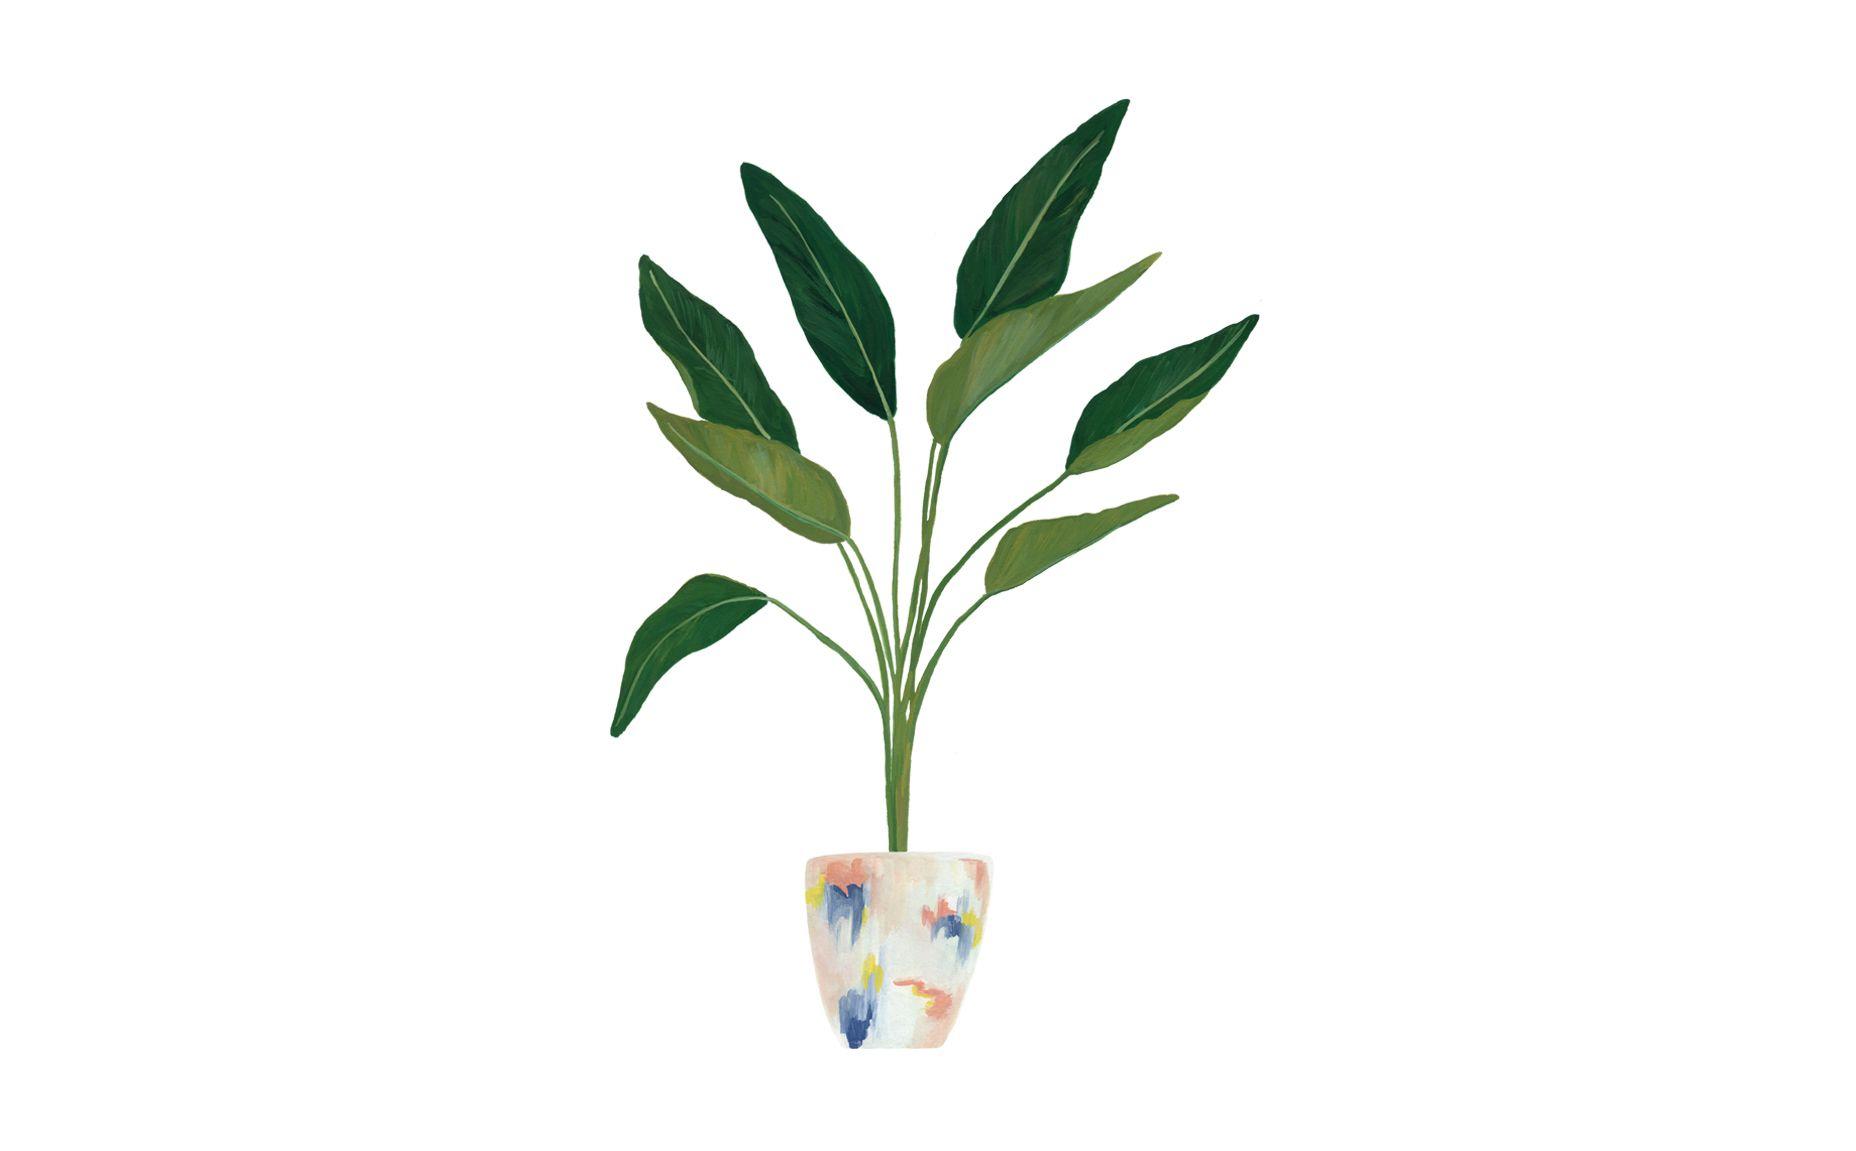 Minimal White Green Botanical Potted Plant Leaves Desktop